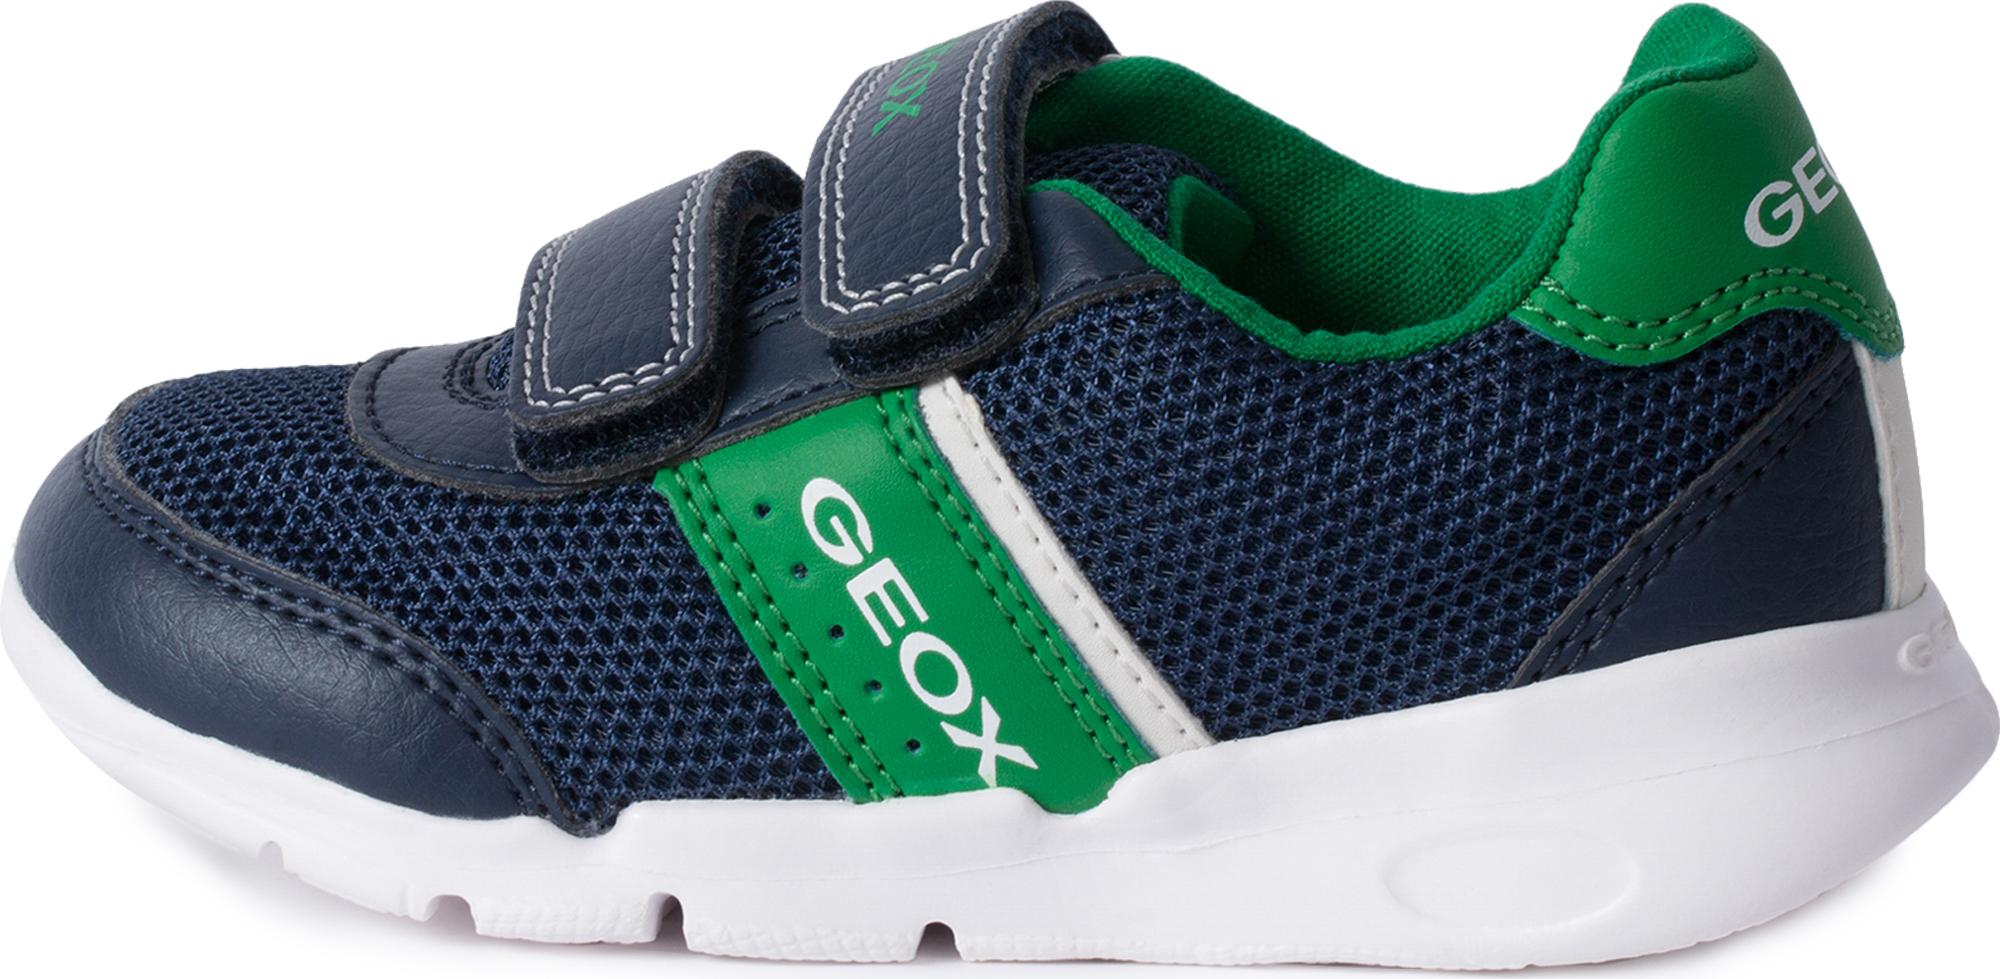 Geox Кроссовки для мальчиков Geox Runner, размер 26 цена 2017